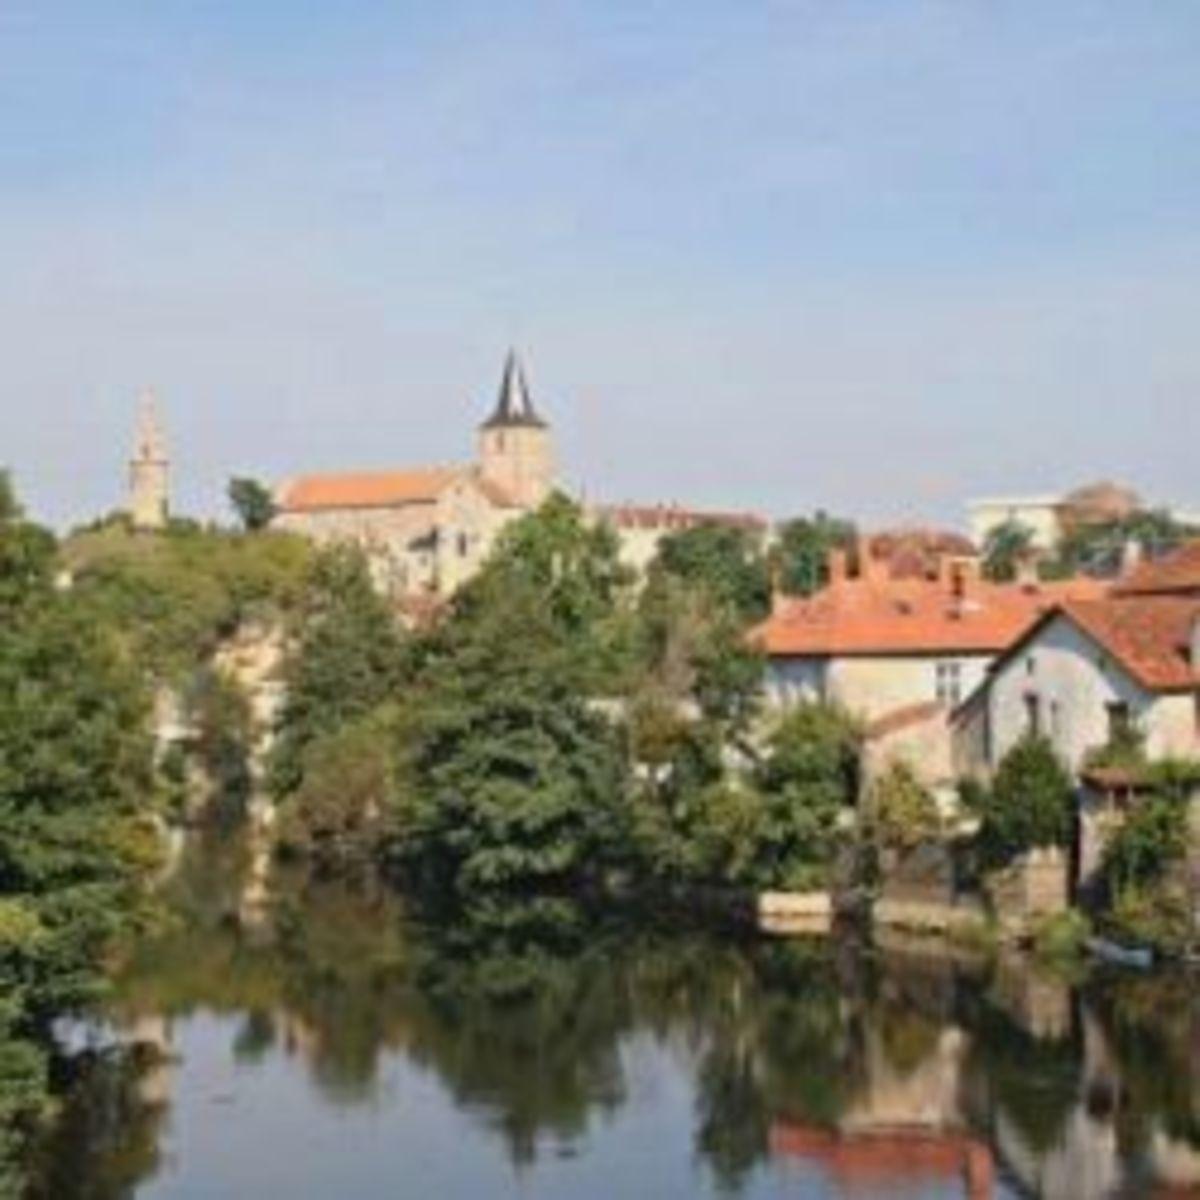 Montmorillon, the town seen from the bridge